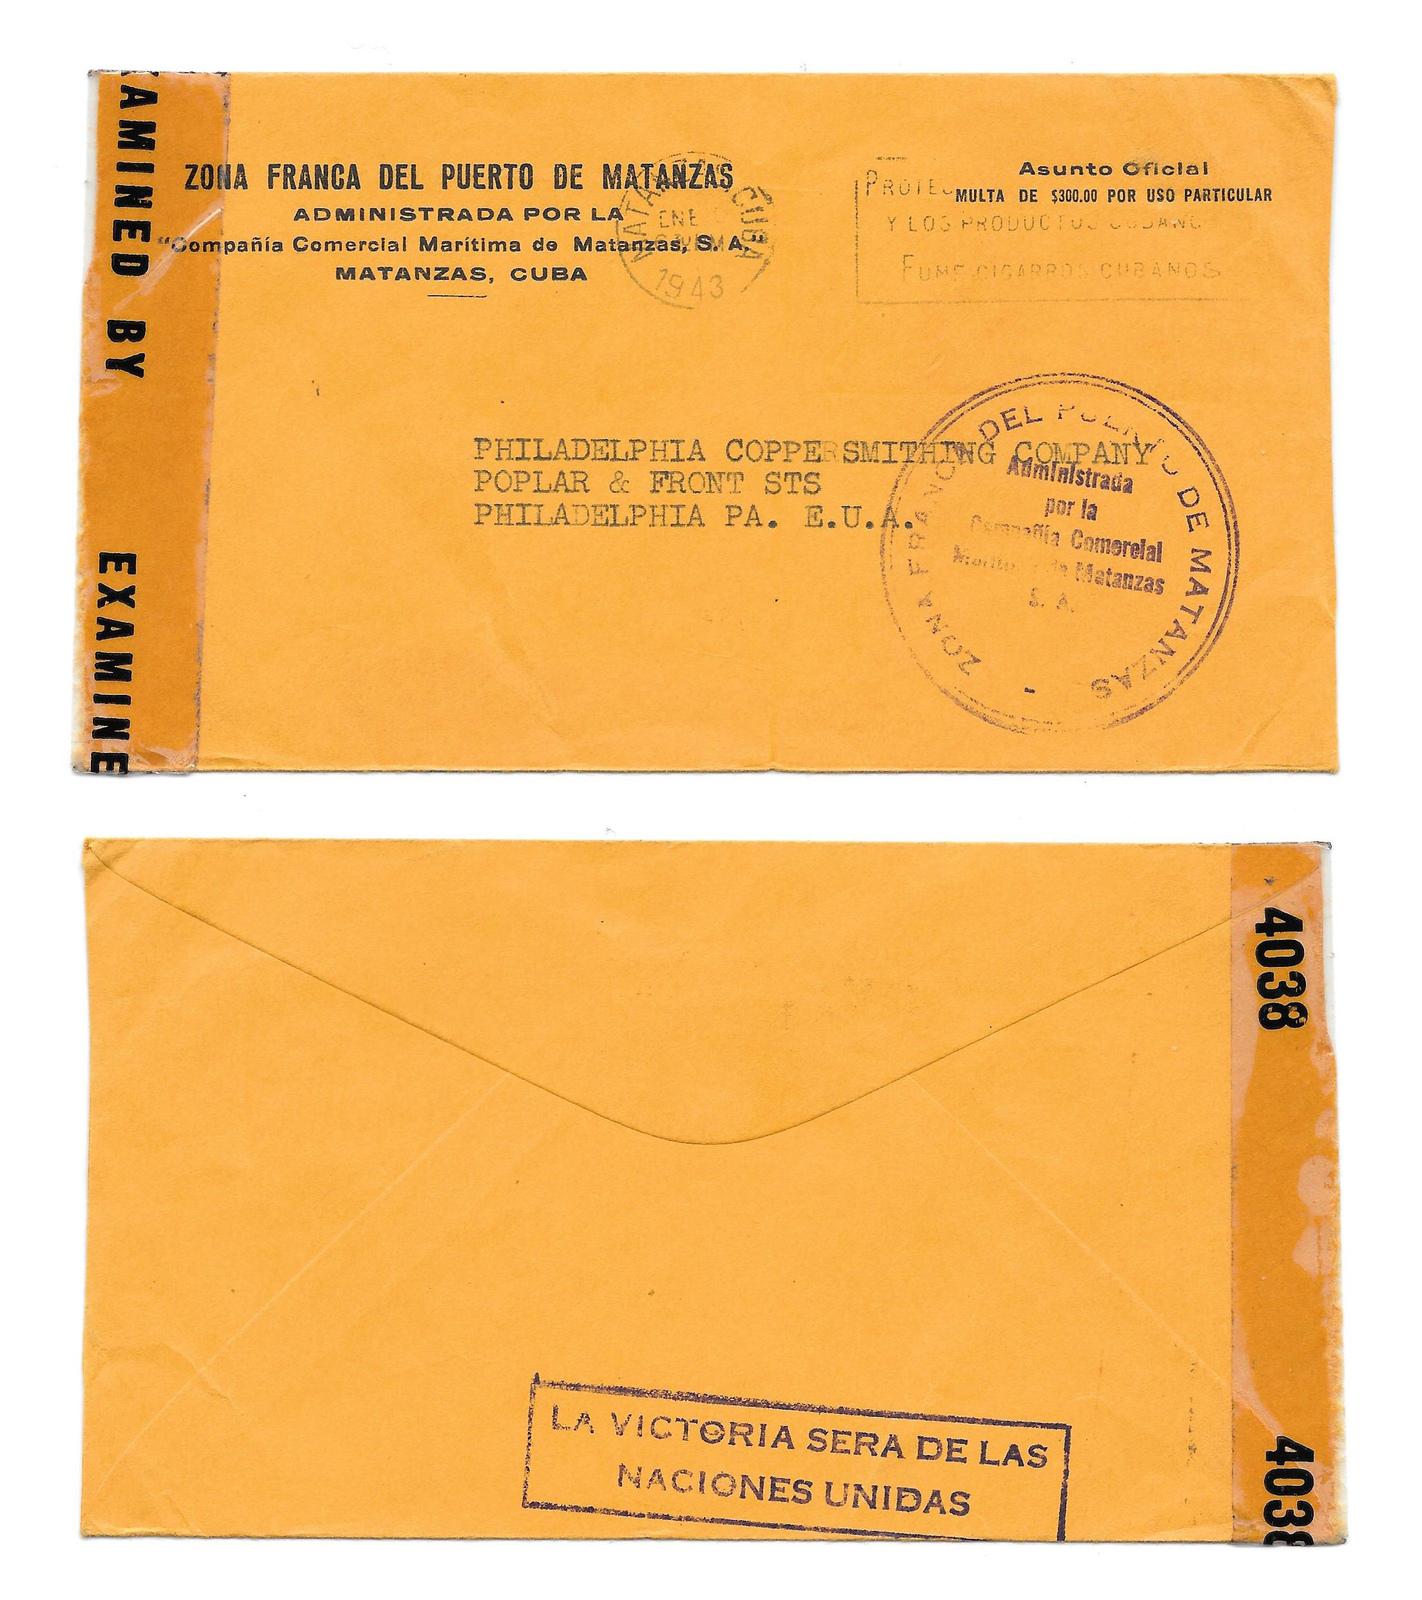 99 br 132 315 cuba censored offical free mail zona franca del puerto de matanzas yellow merge